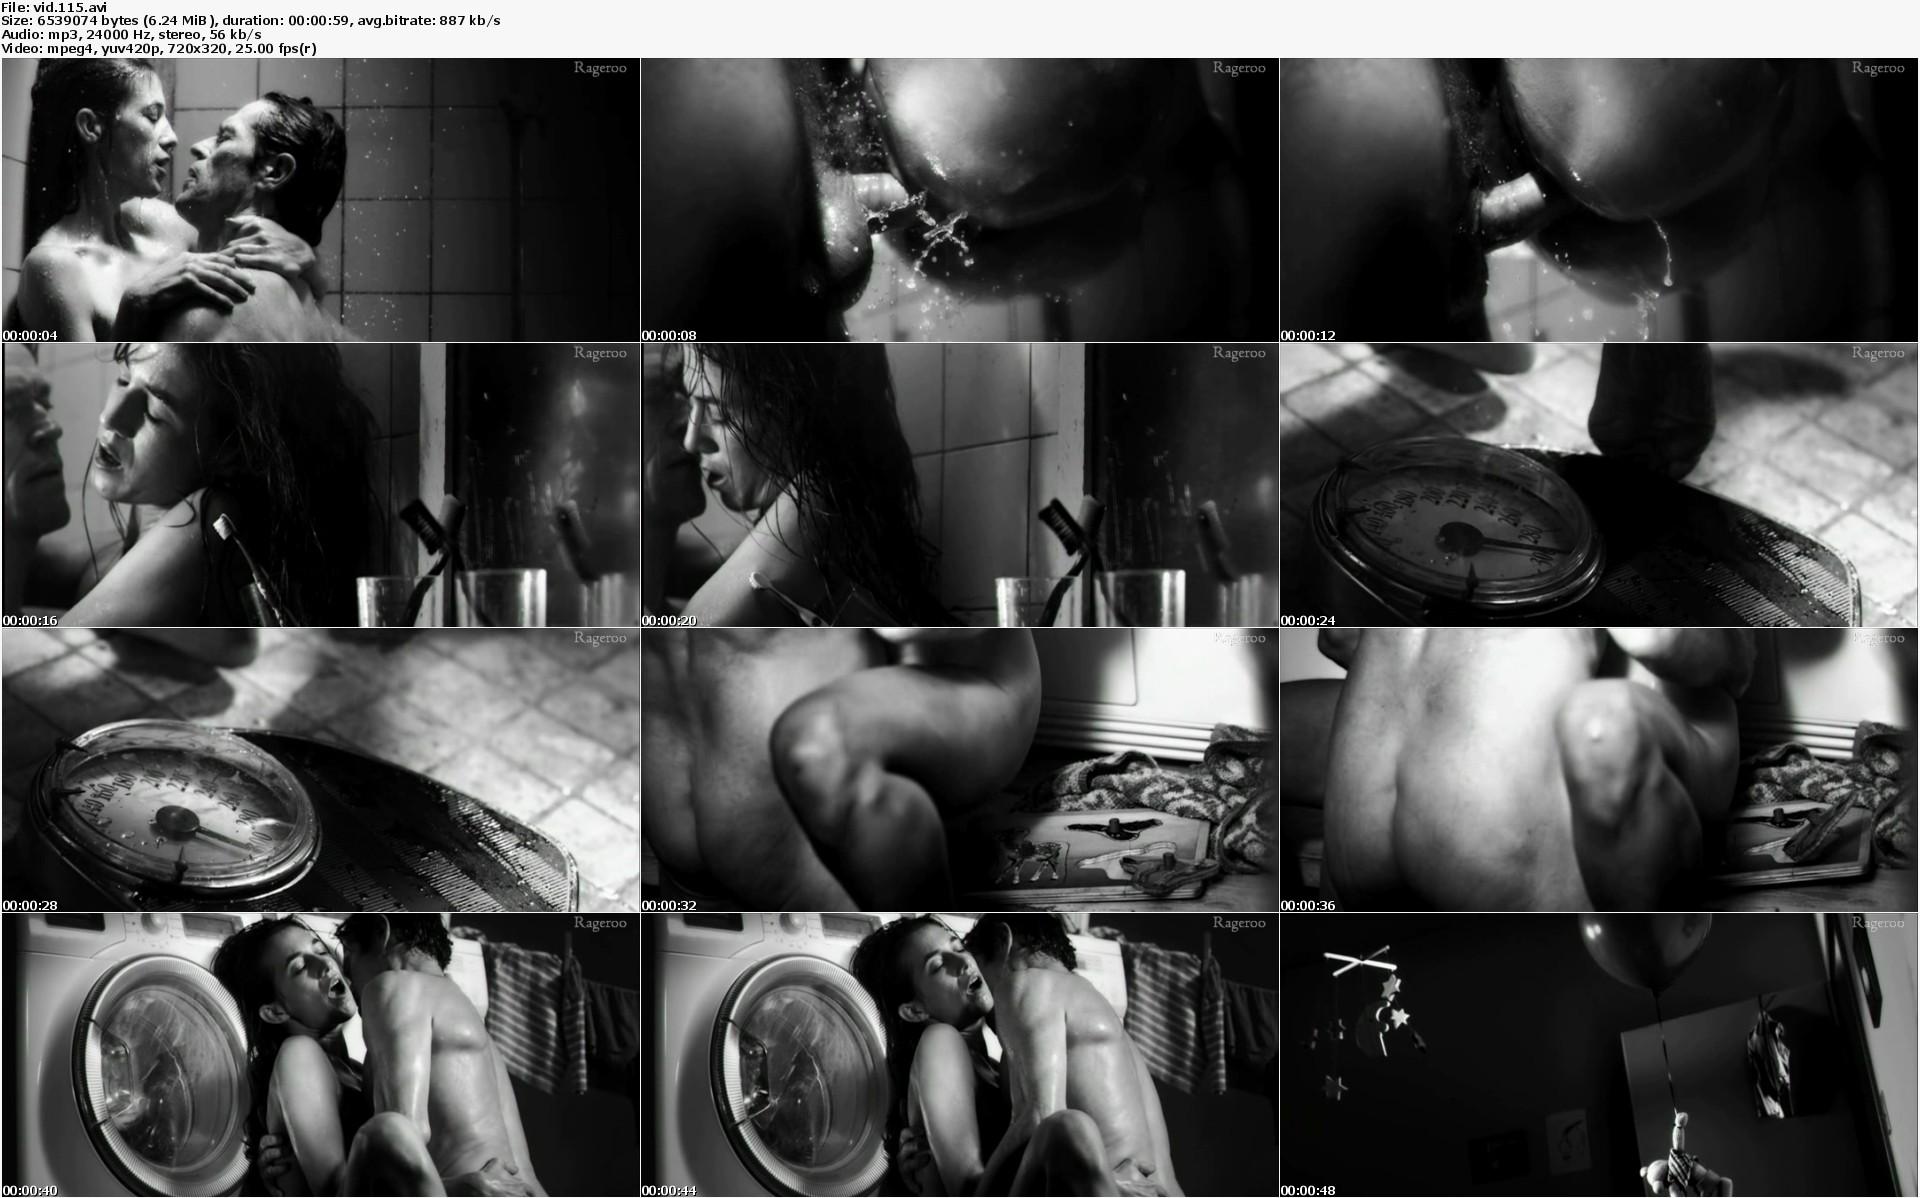 Шарлотта генсбур порно онлайн 5 фотография